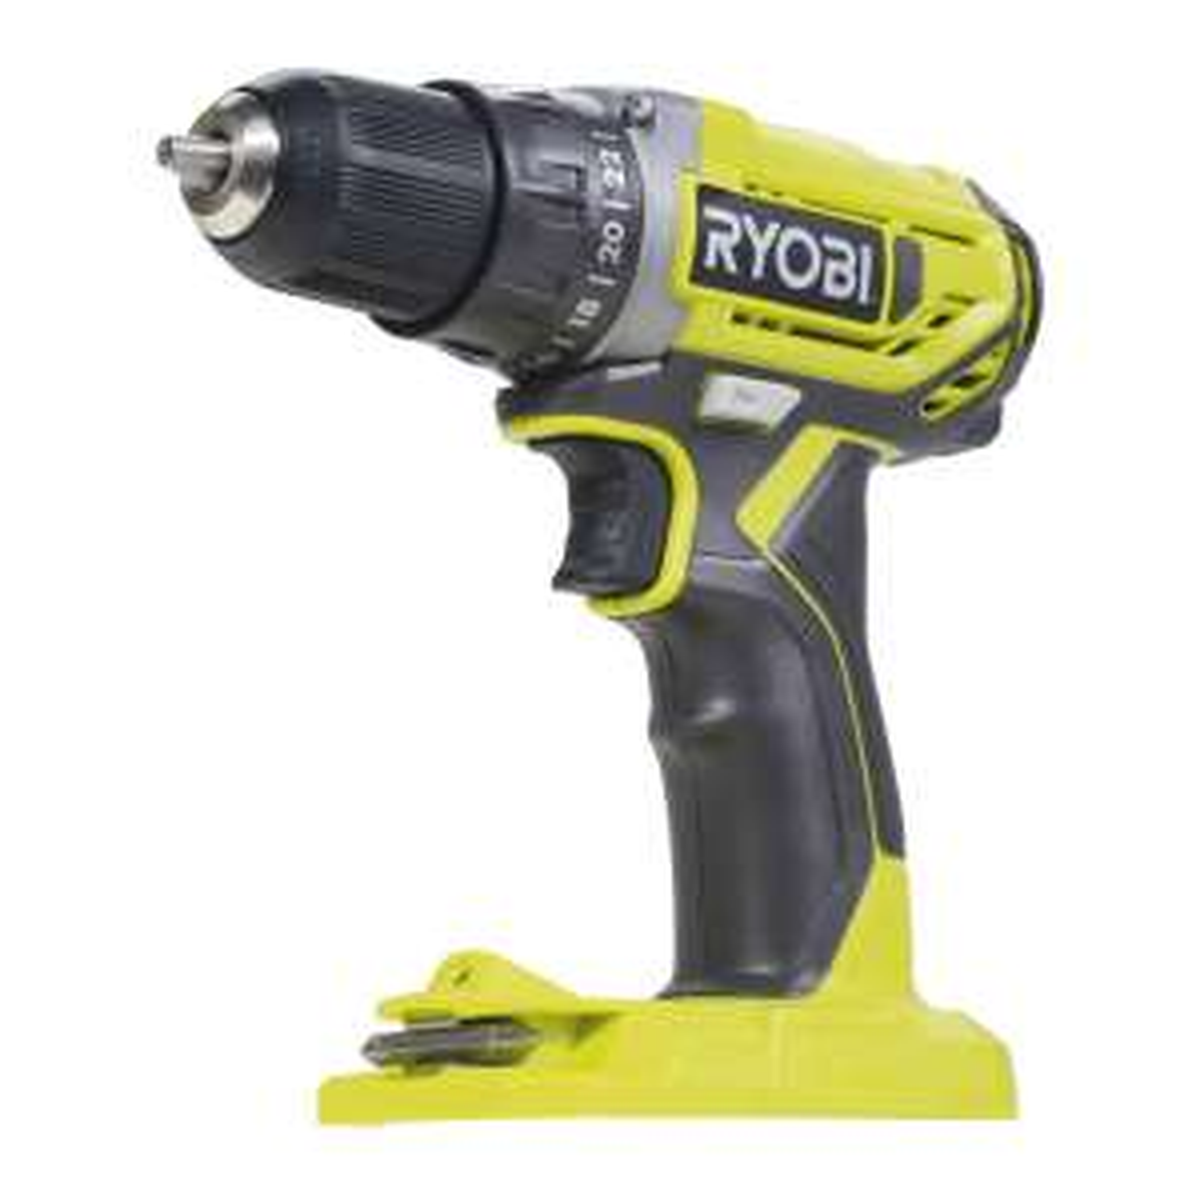 Ryobi R18DD2-0 18 V Akku-Bohrschrauber | Bohren in Holz Und Metall | LED-Beleuchtung